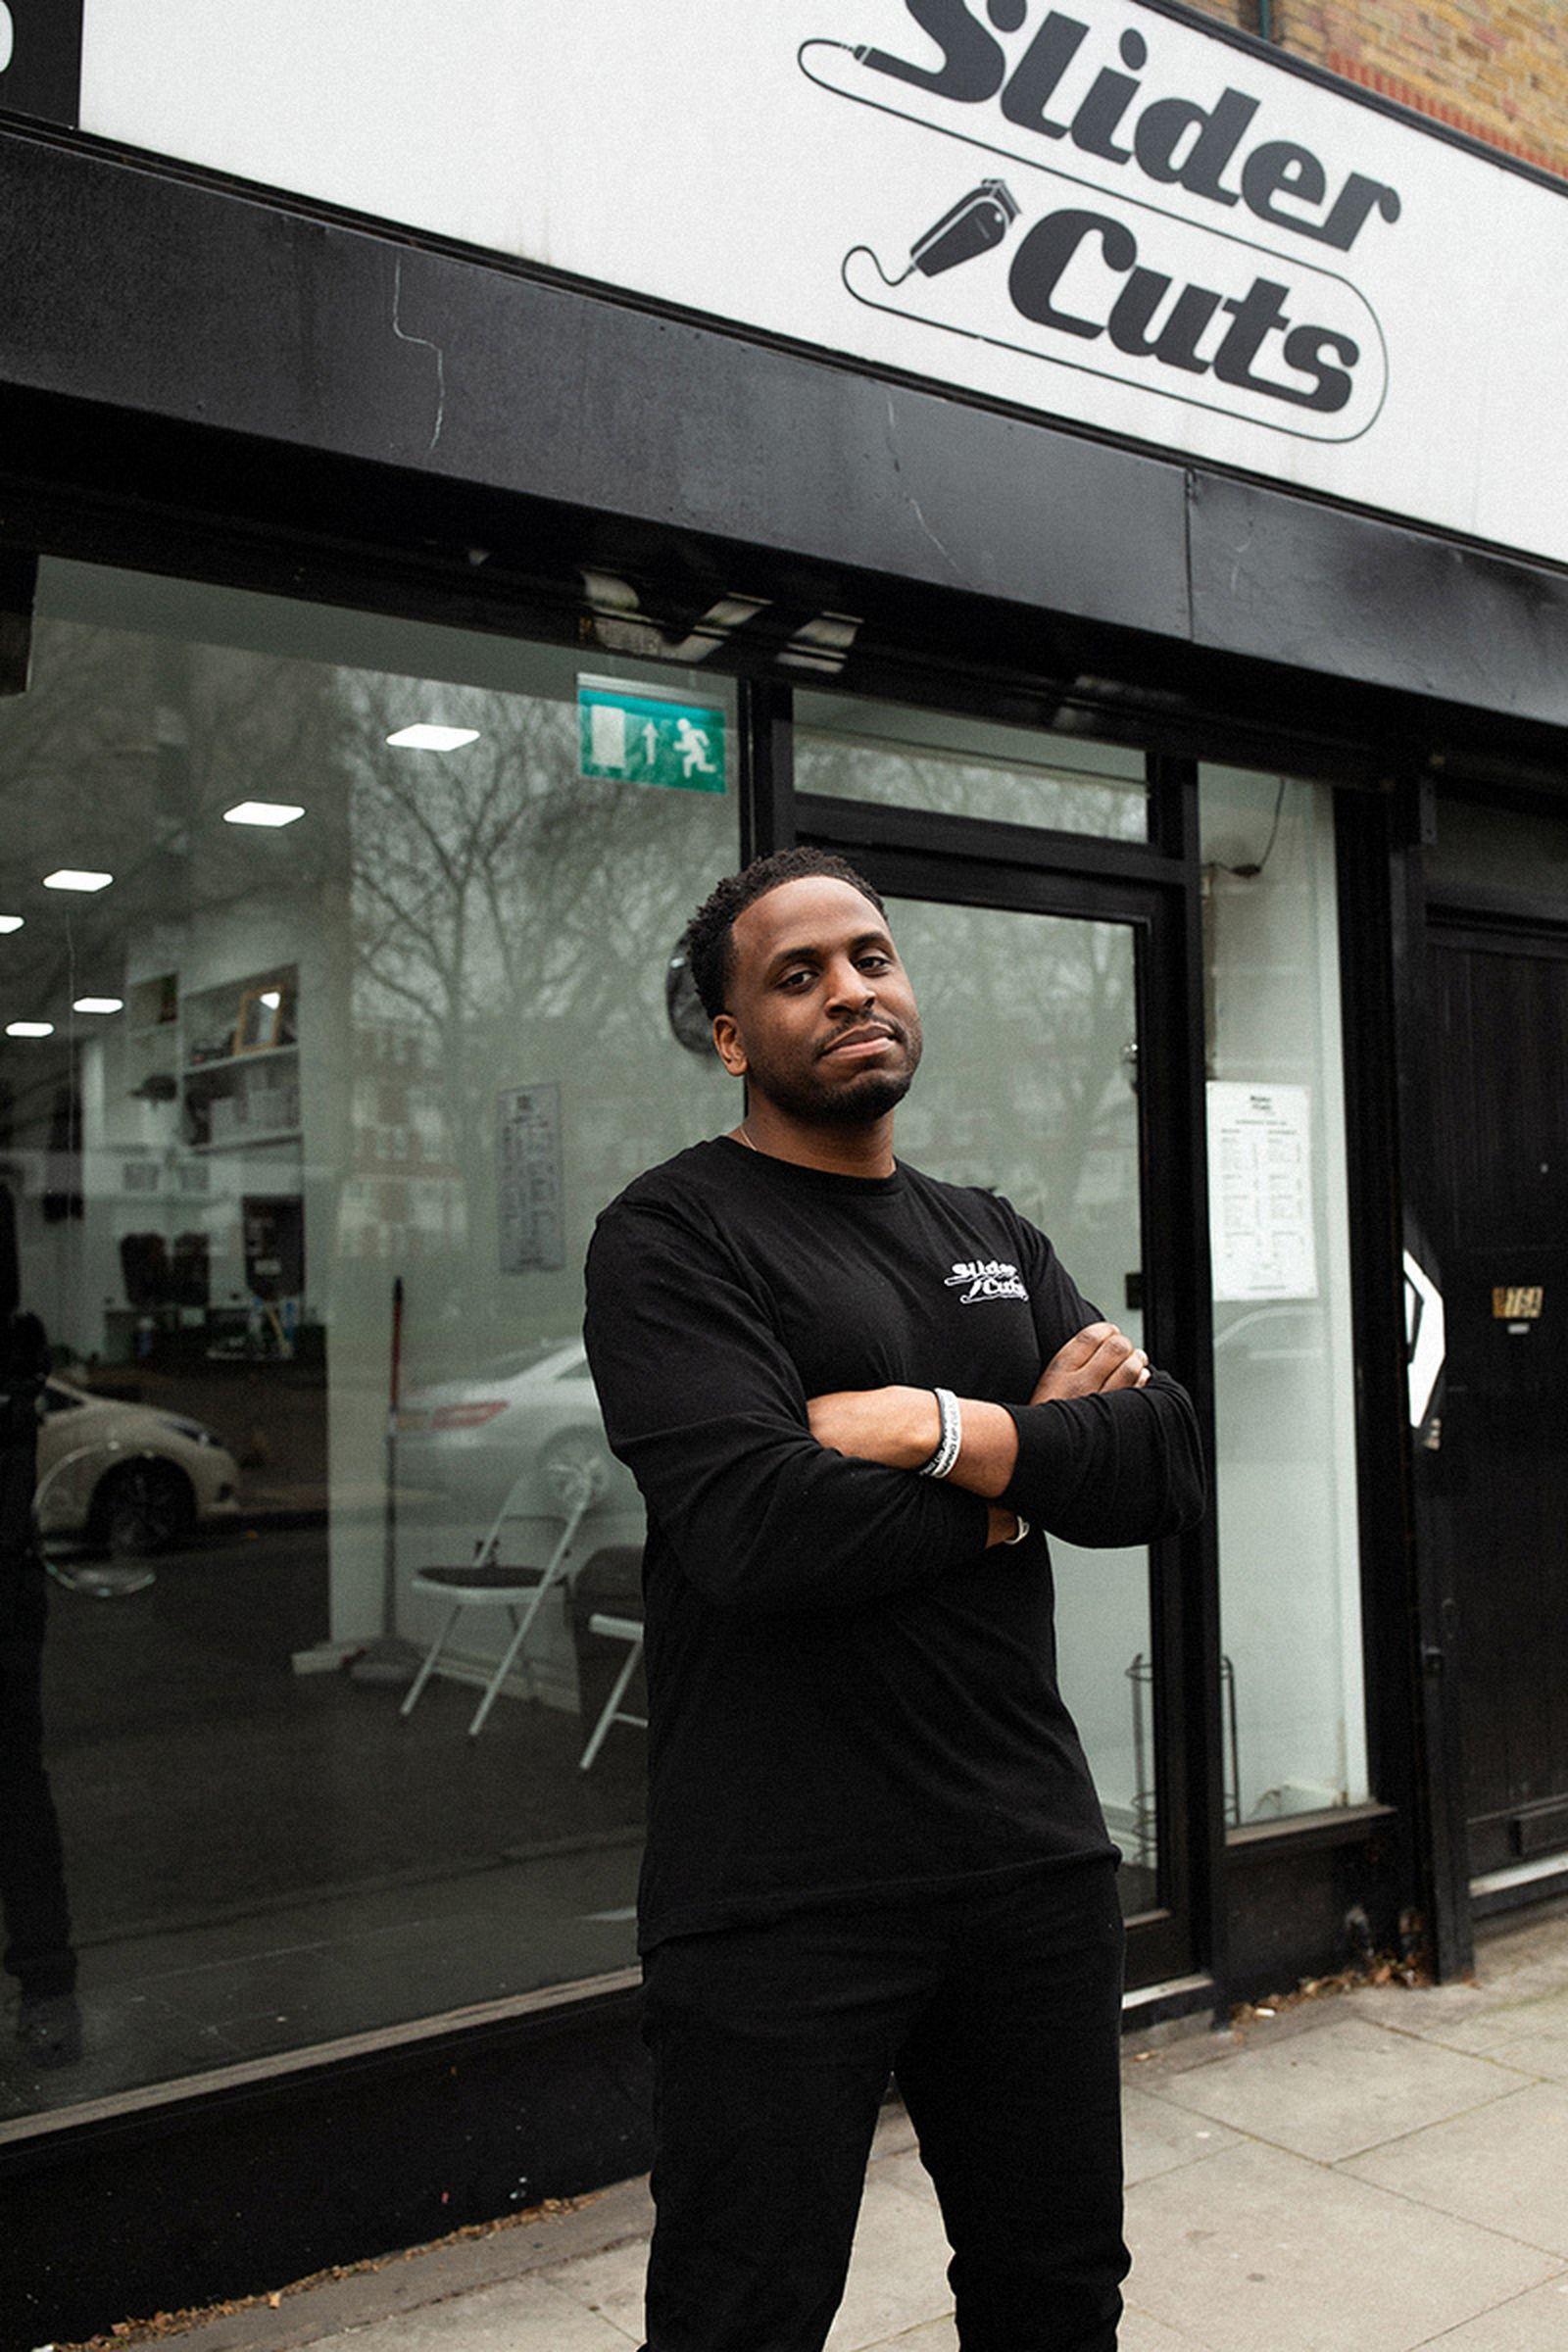 slidercuts-barber-interview-05